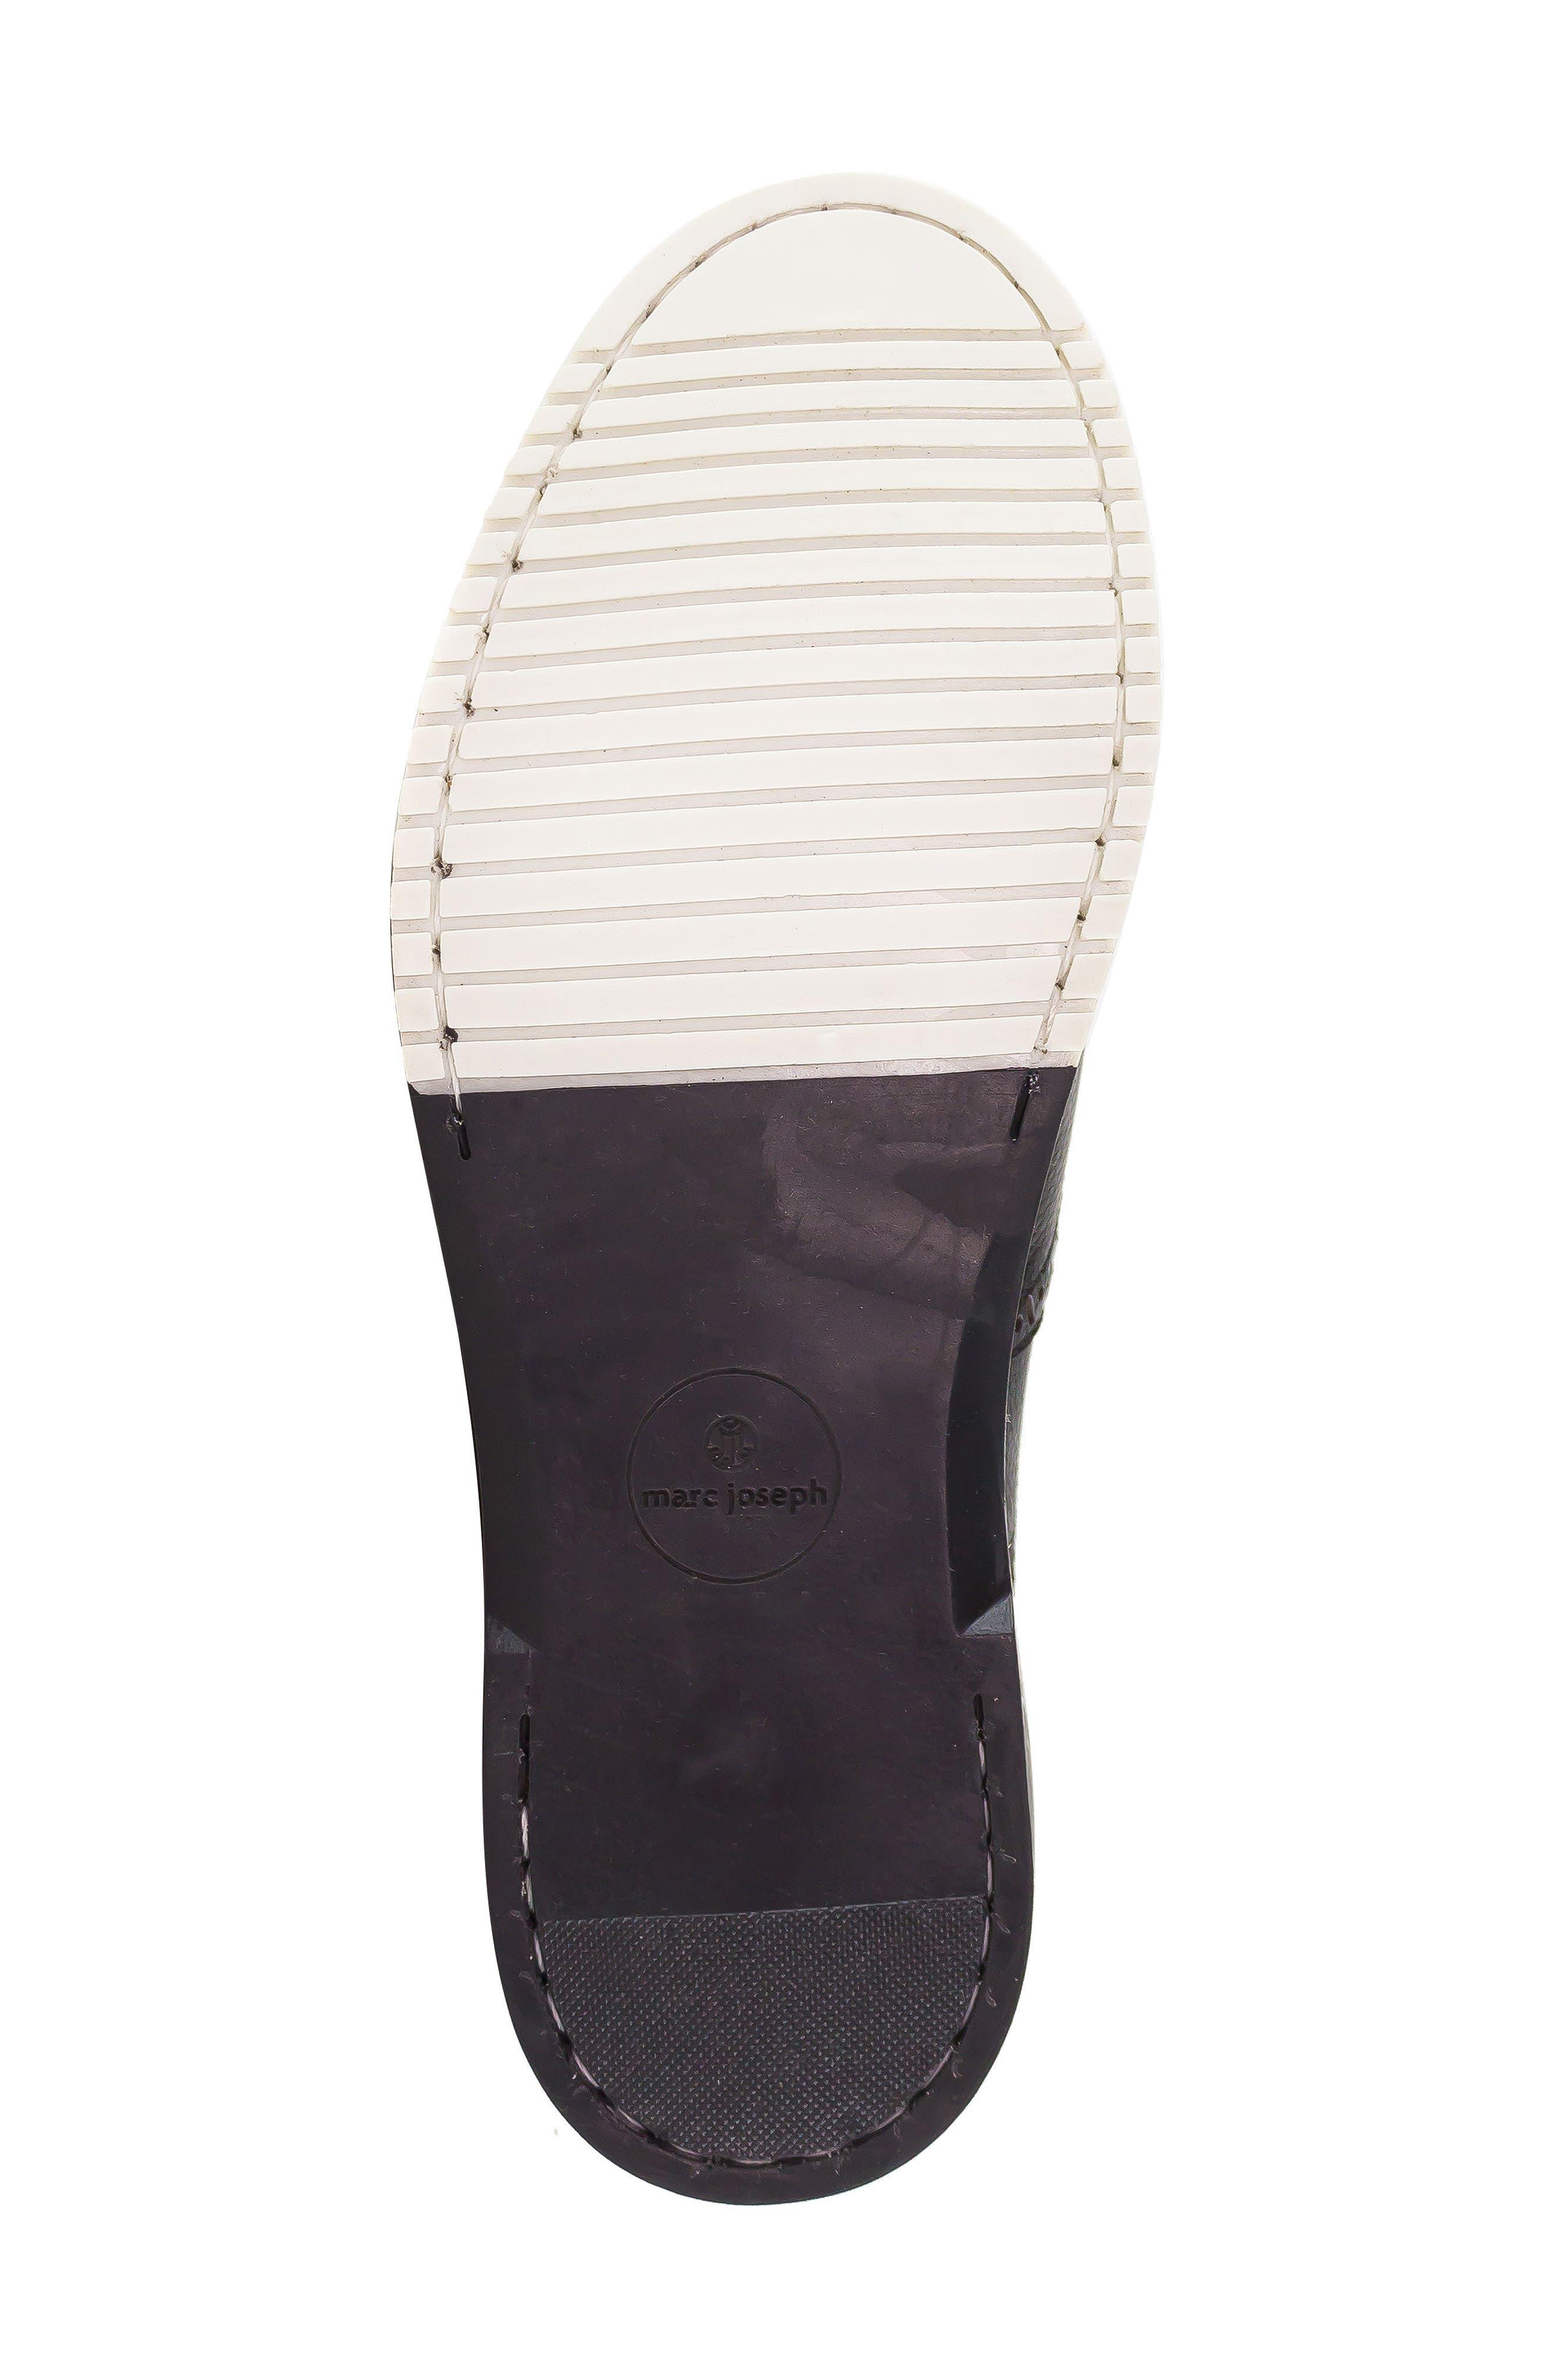 5th Ave Wingtip Sneaker,                             Alternate thumbnail 21, color,